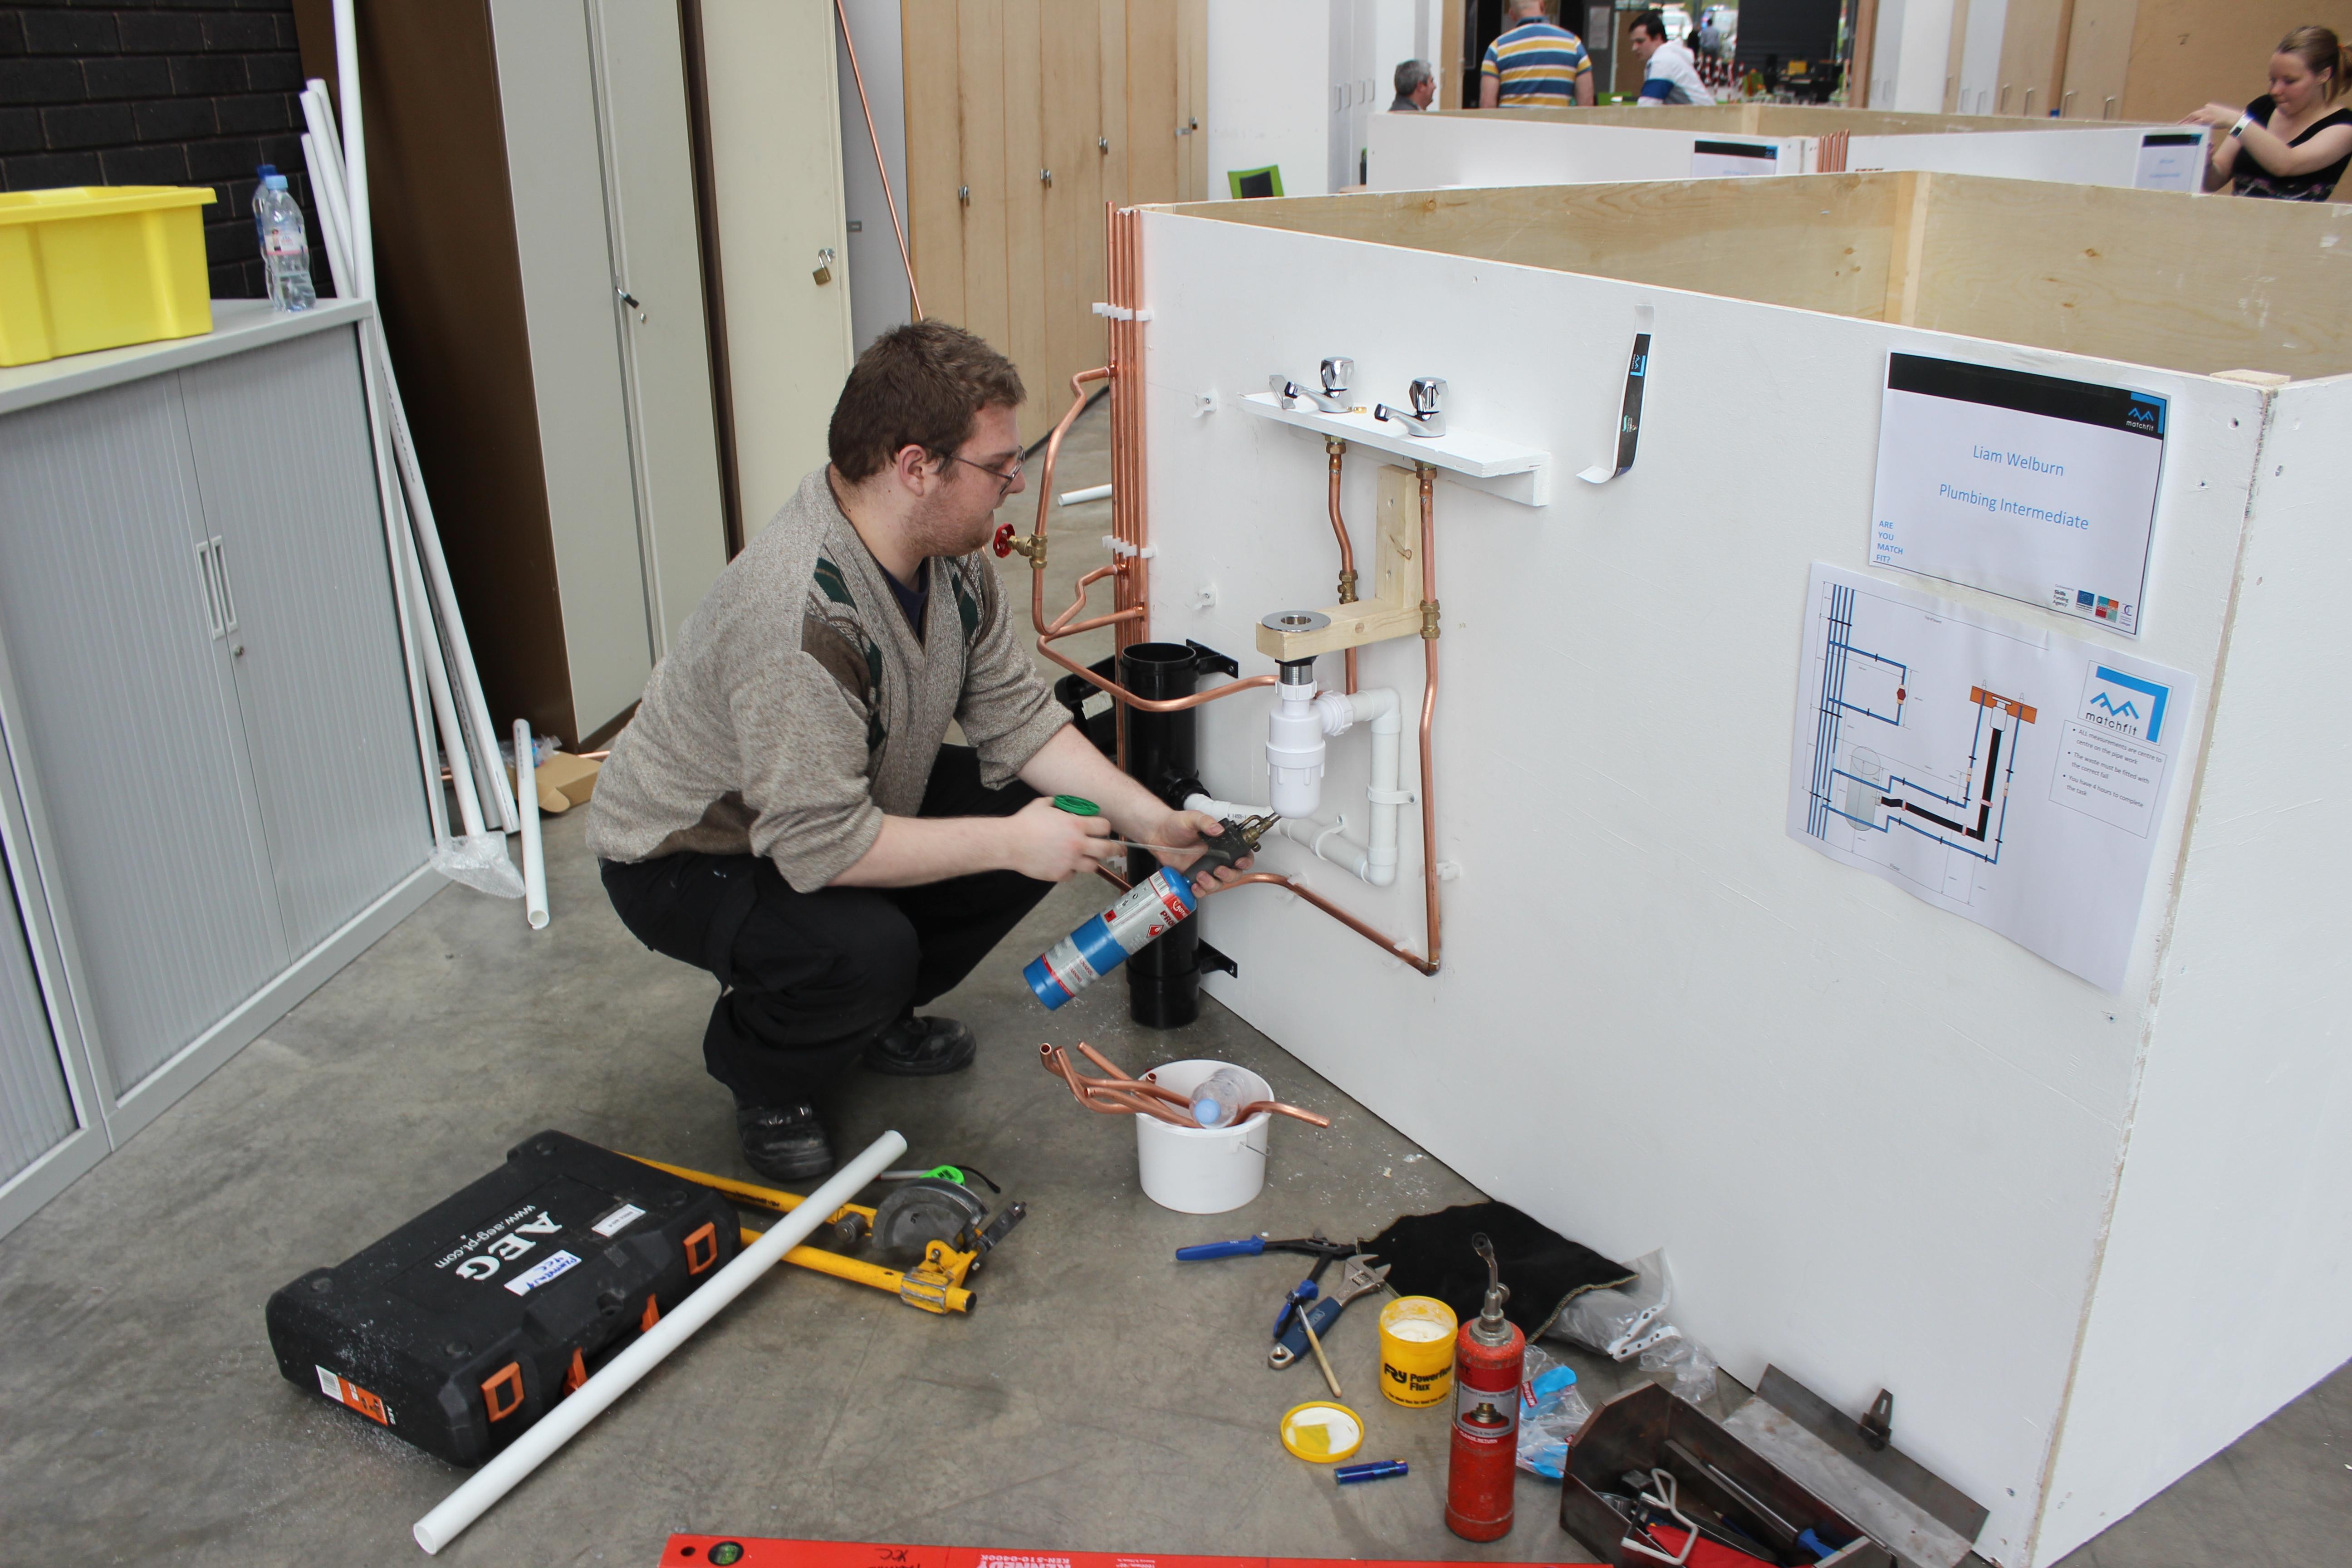 installation plumbing same heater drain day plumbers kelowna me near water west companies a choice repair